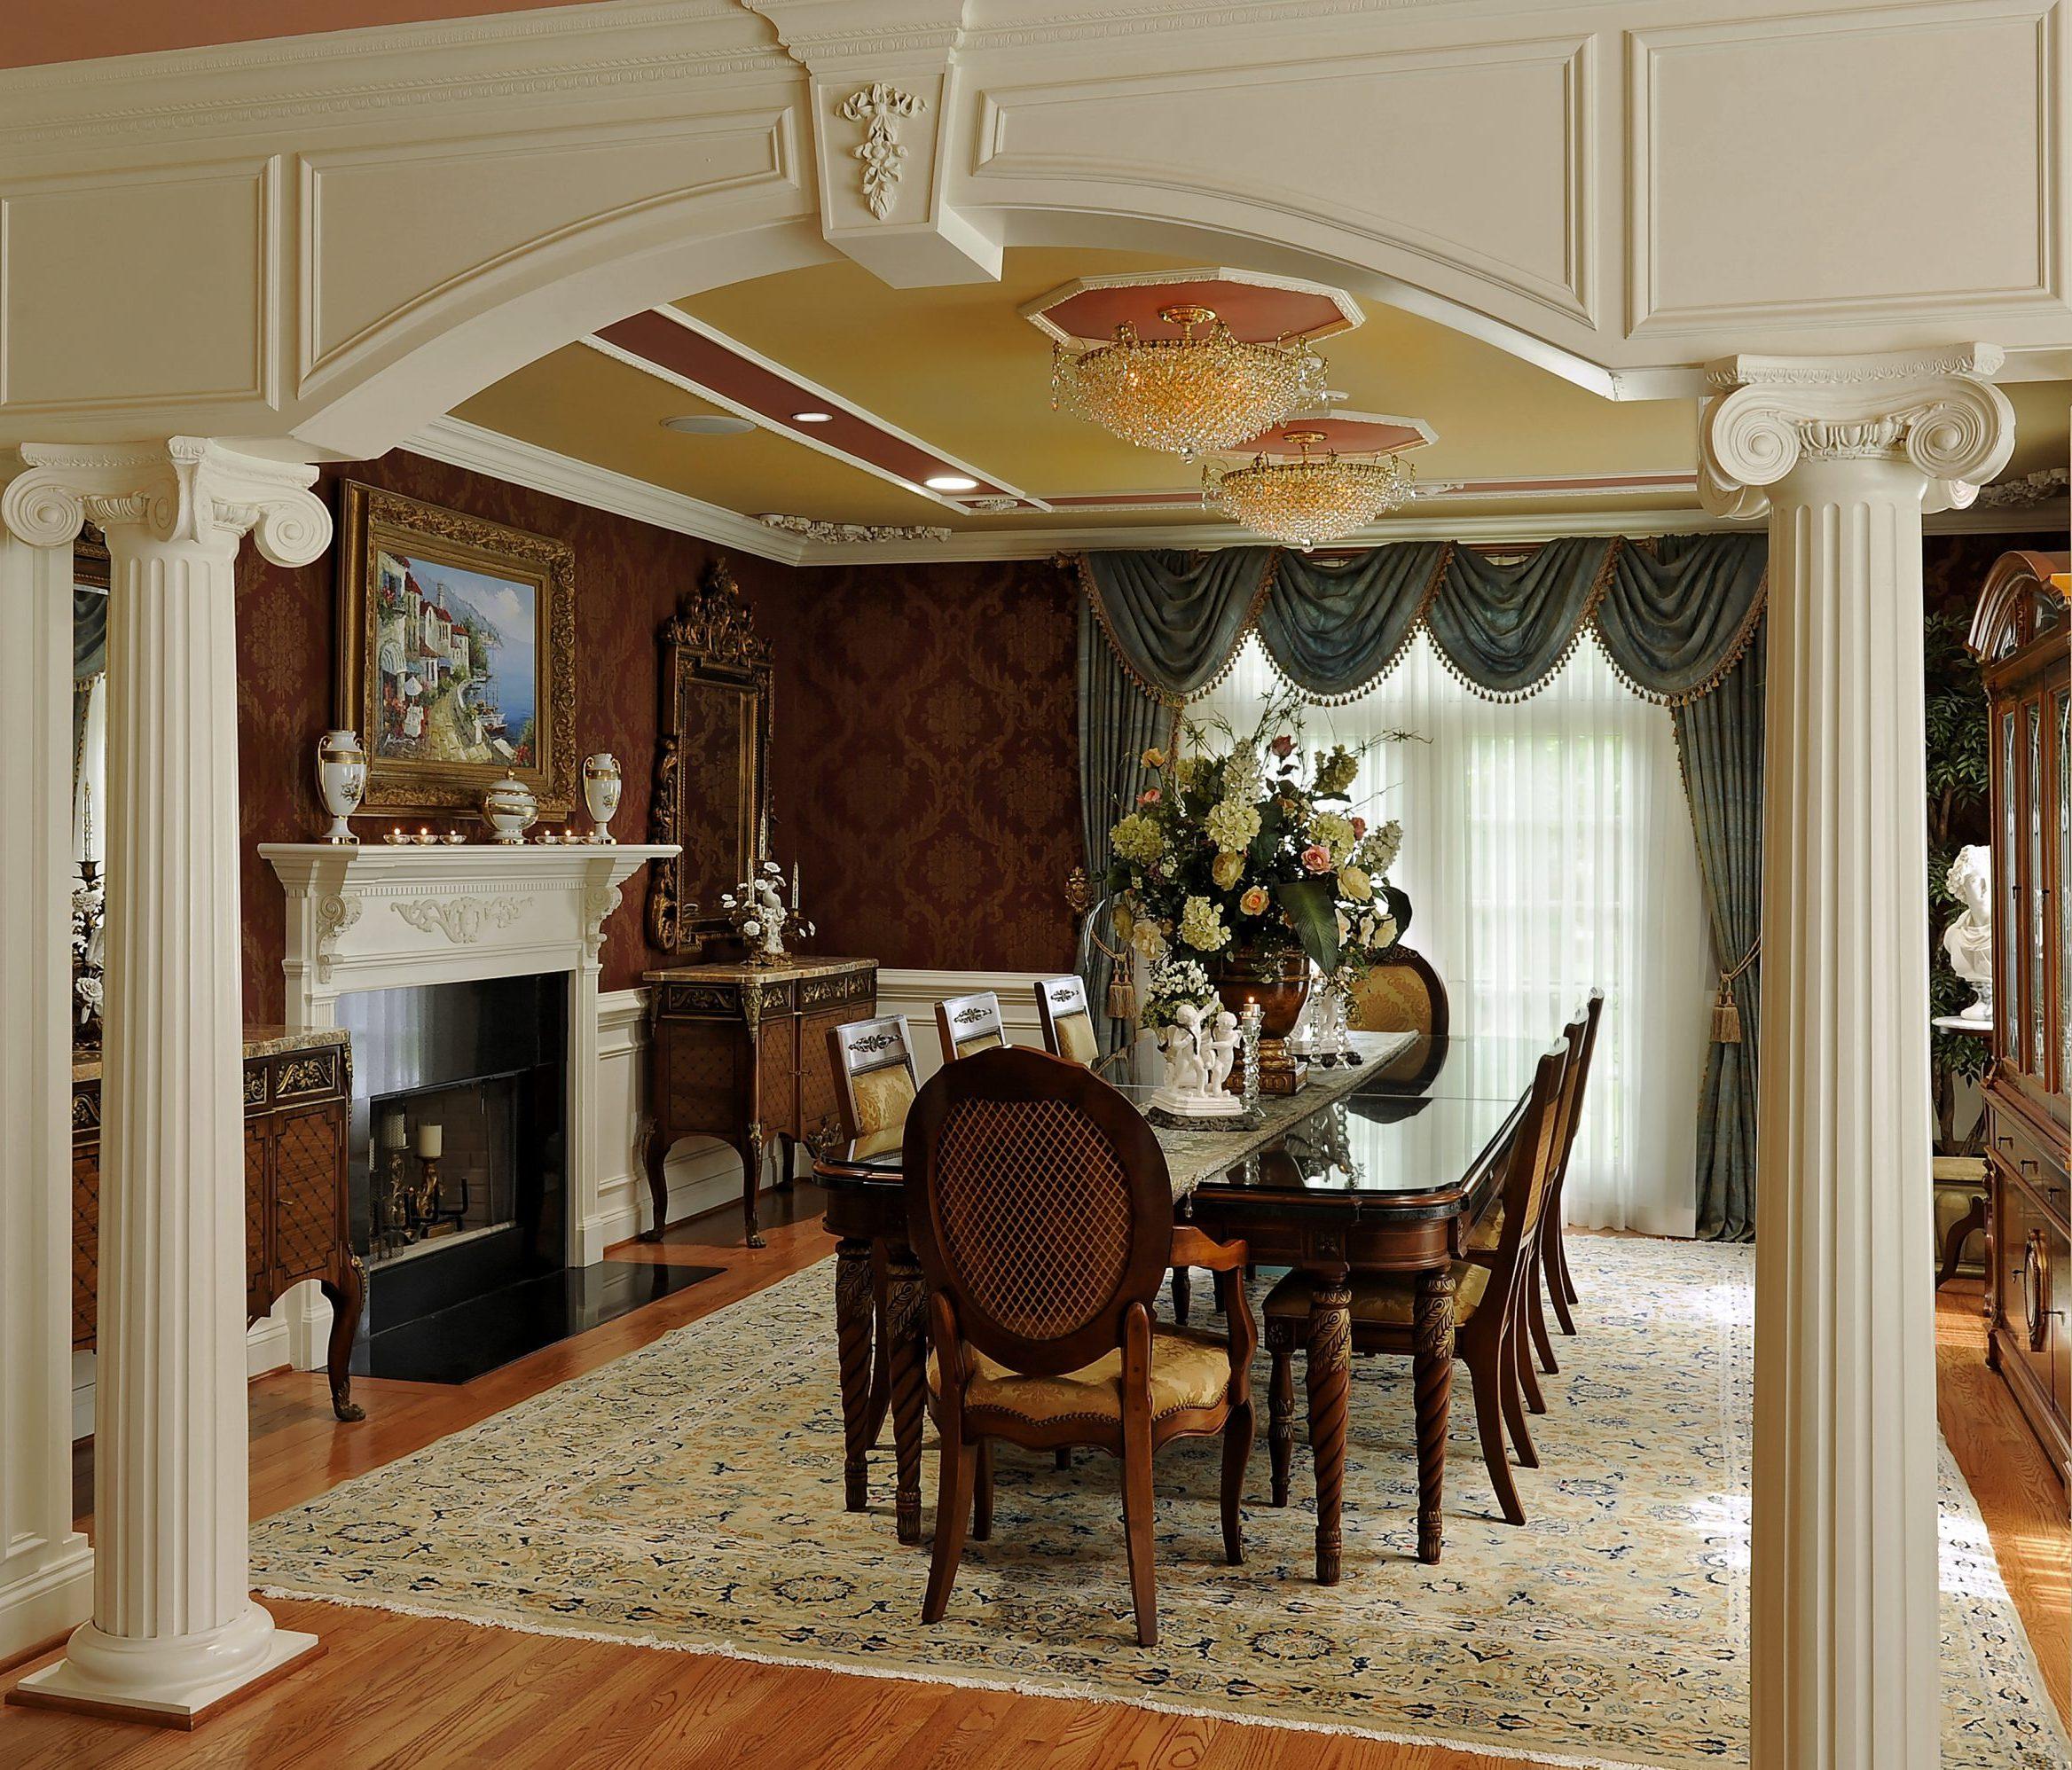 Potomac-MD-Interior-Designer-Shiva-Rostami-Dining-Room-entrance-feature-millwork-McLean-VA